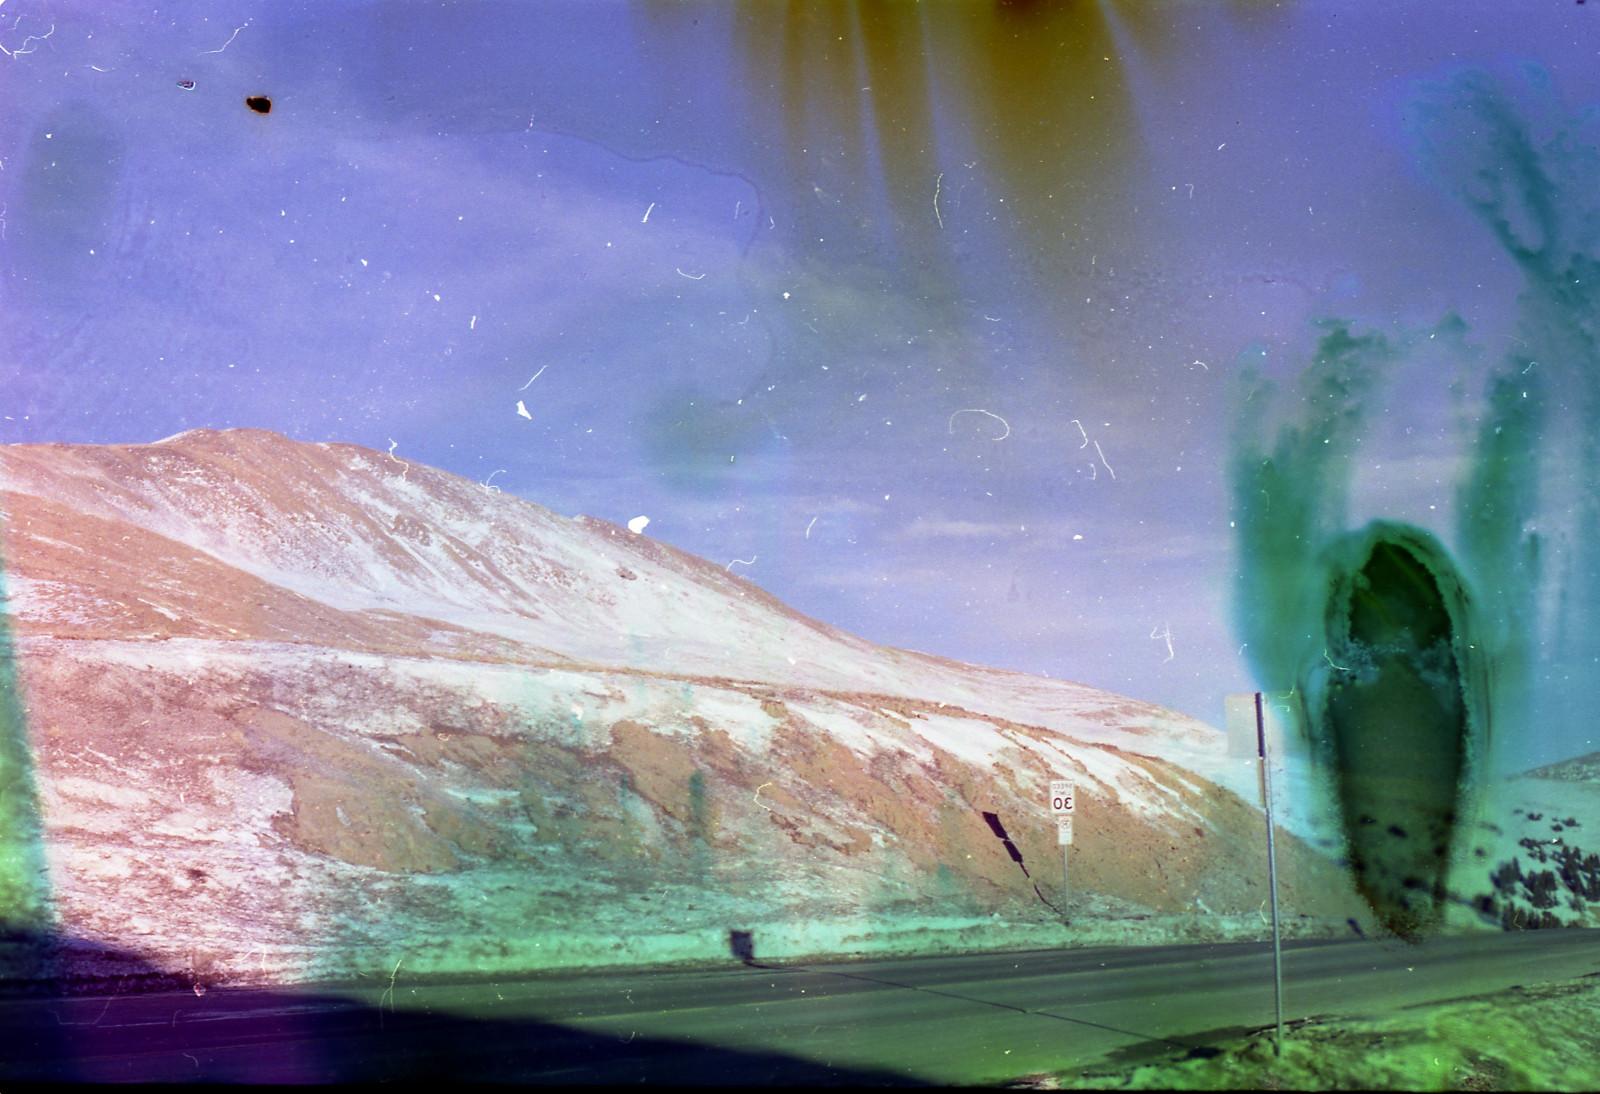 Masaüstü Manzara Boyama Su Doğa Boşluk Gökyüzü Atmosfer